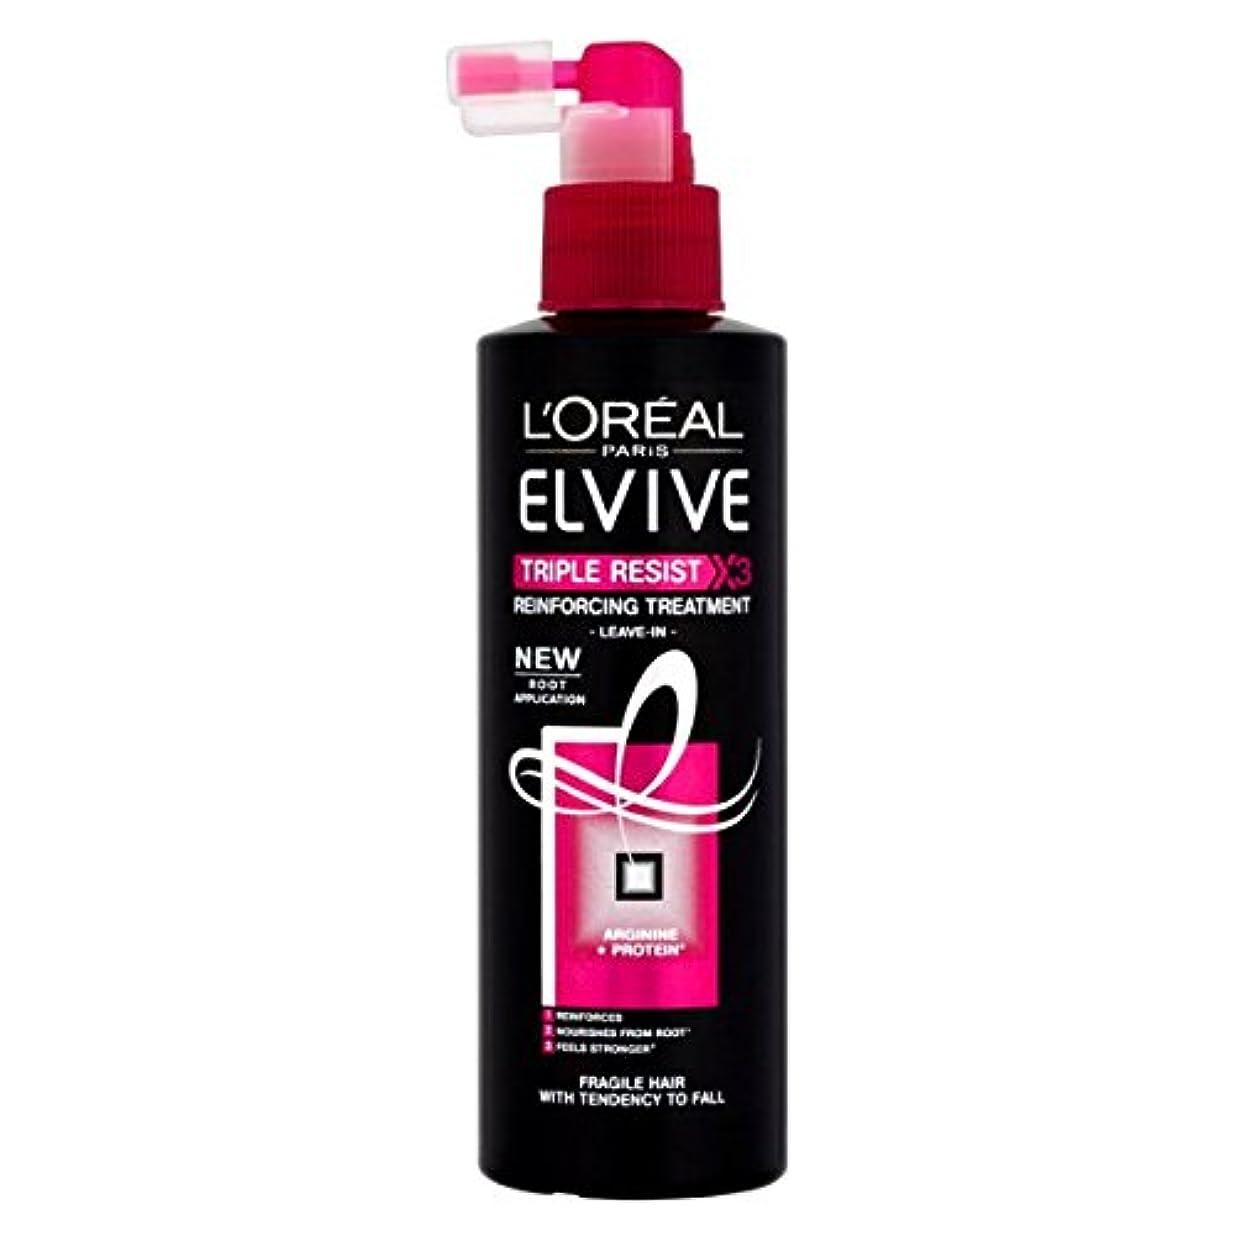 体系的にジェム外部L 'Oréal Paris Elvive Triple Resist Leave-In verstärkendem Treatment 200 ml